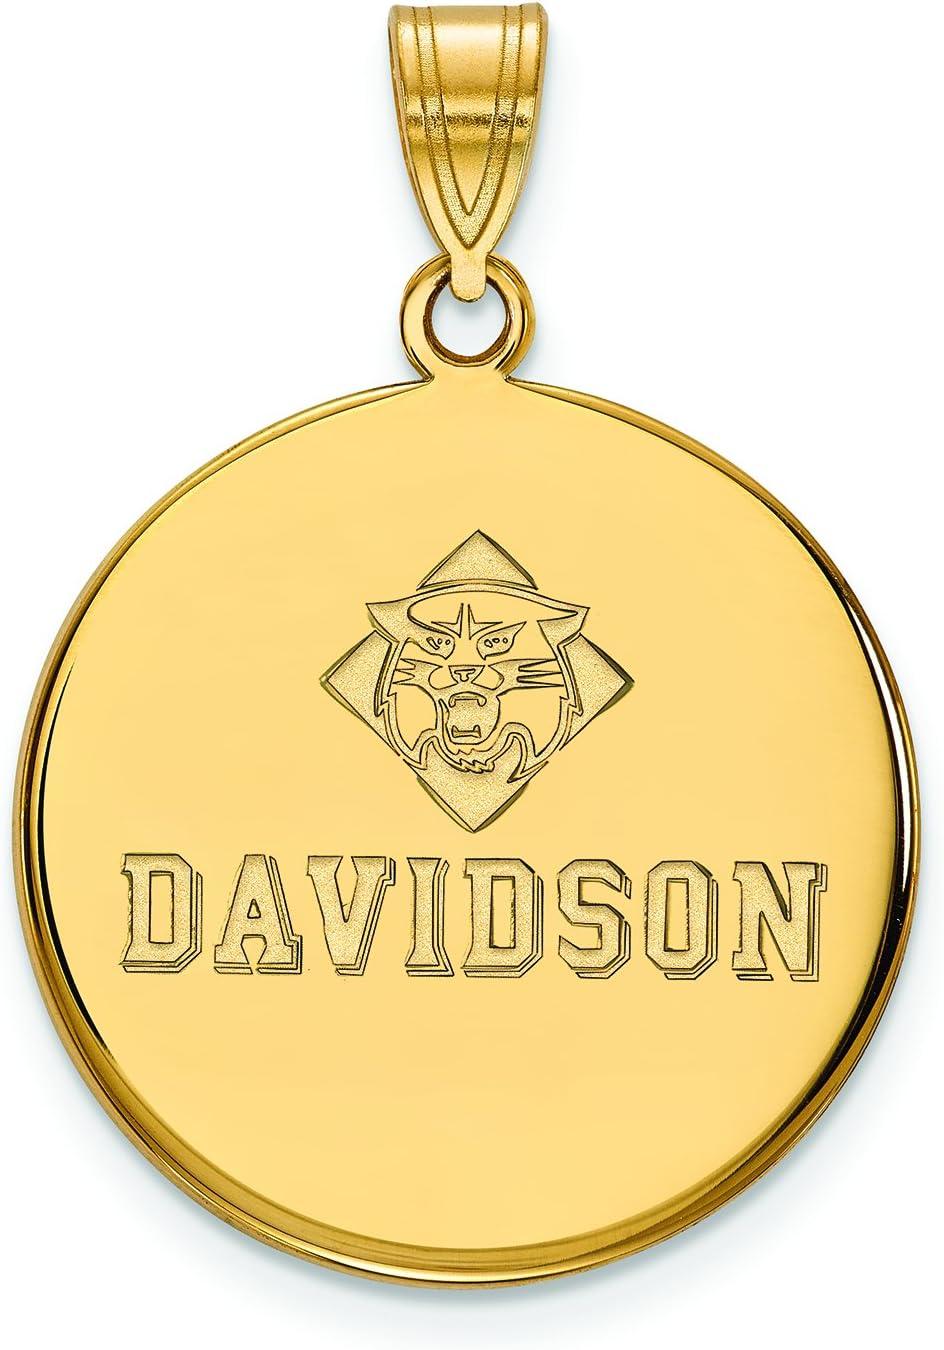 10 ky Davidson College Largeディスクペンダント